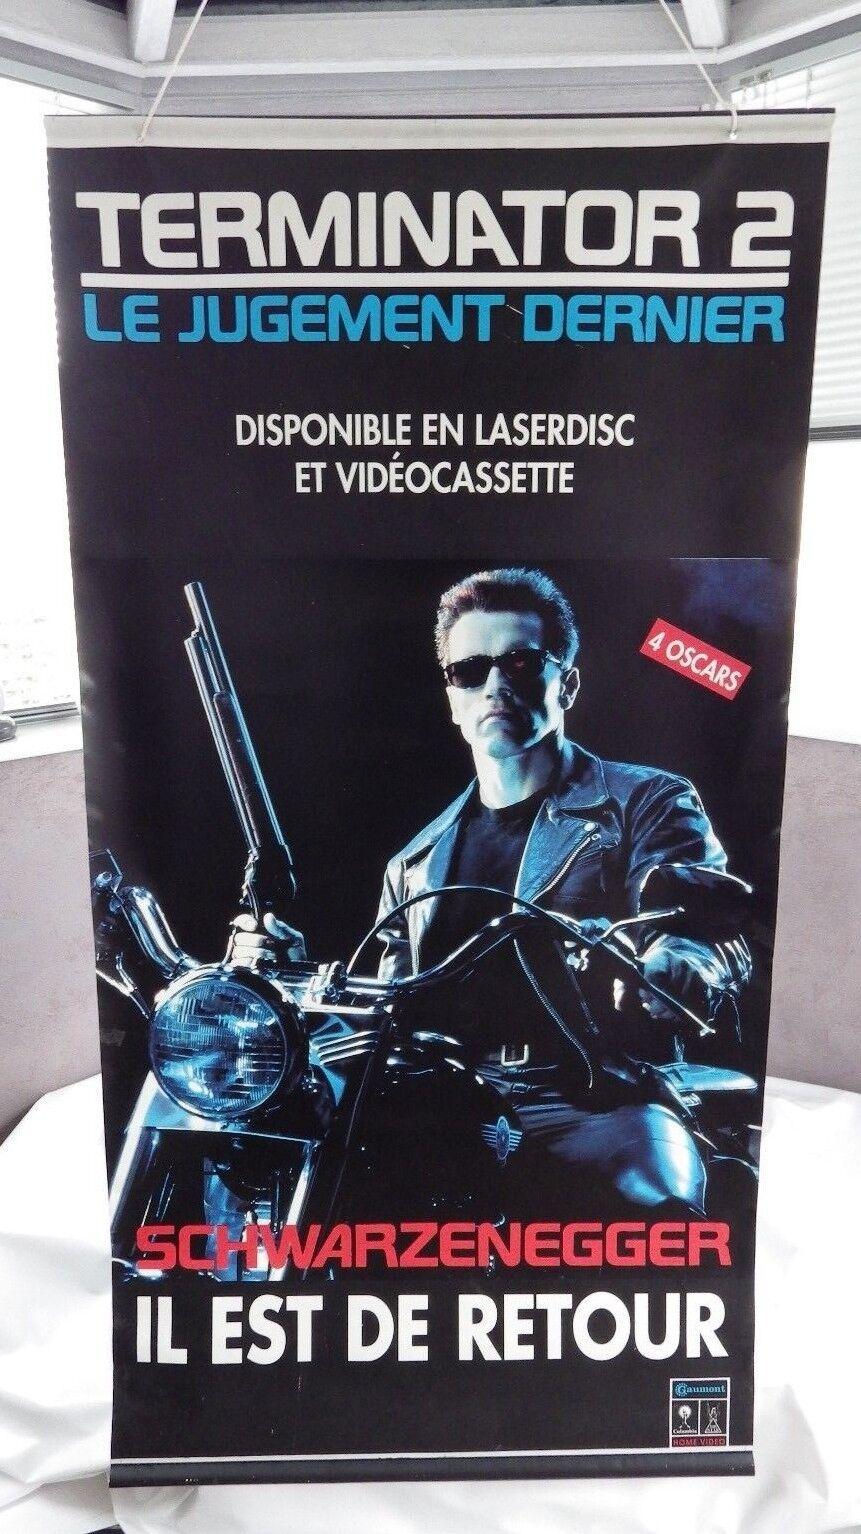 Toile Publicitaire Laserdisc CDV VHS recto v. Terminator 2 Allô maman 200 x 86cm